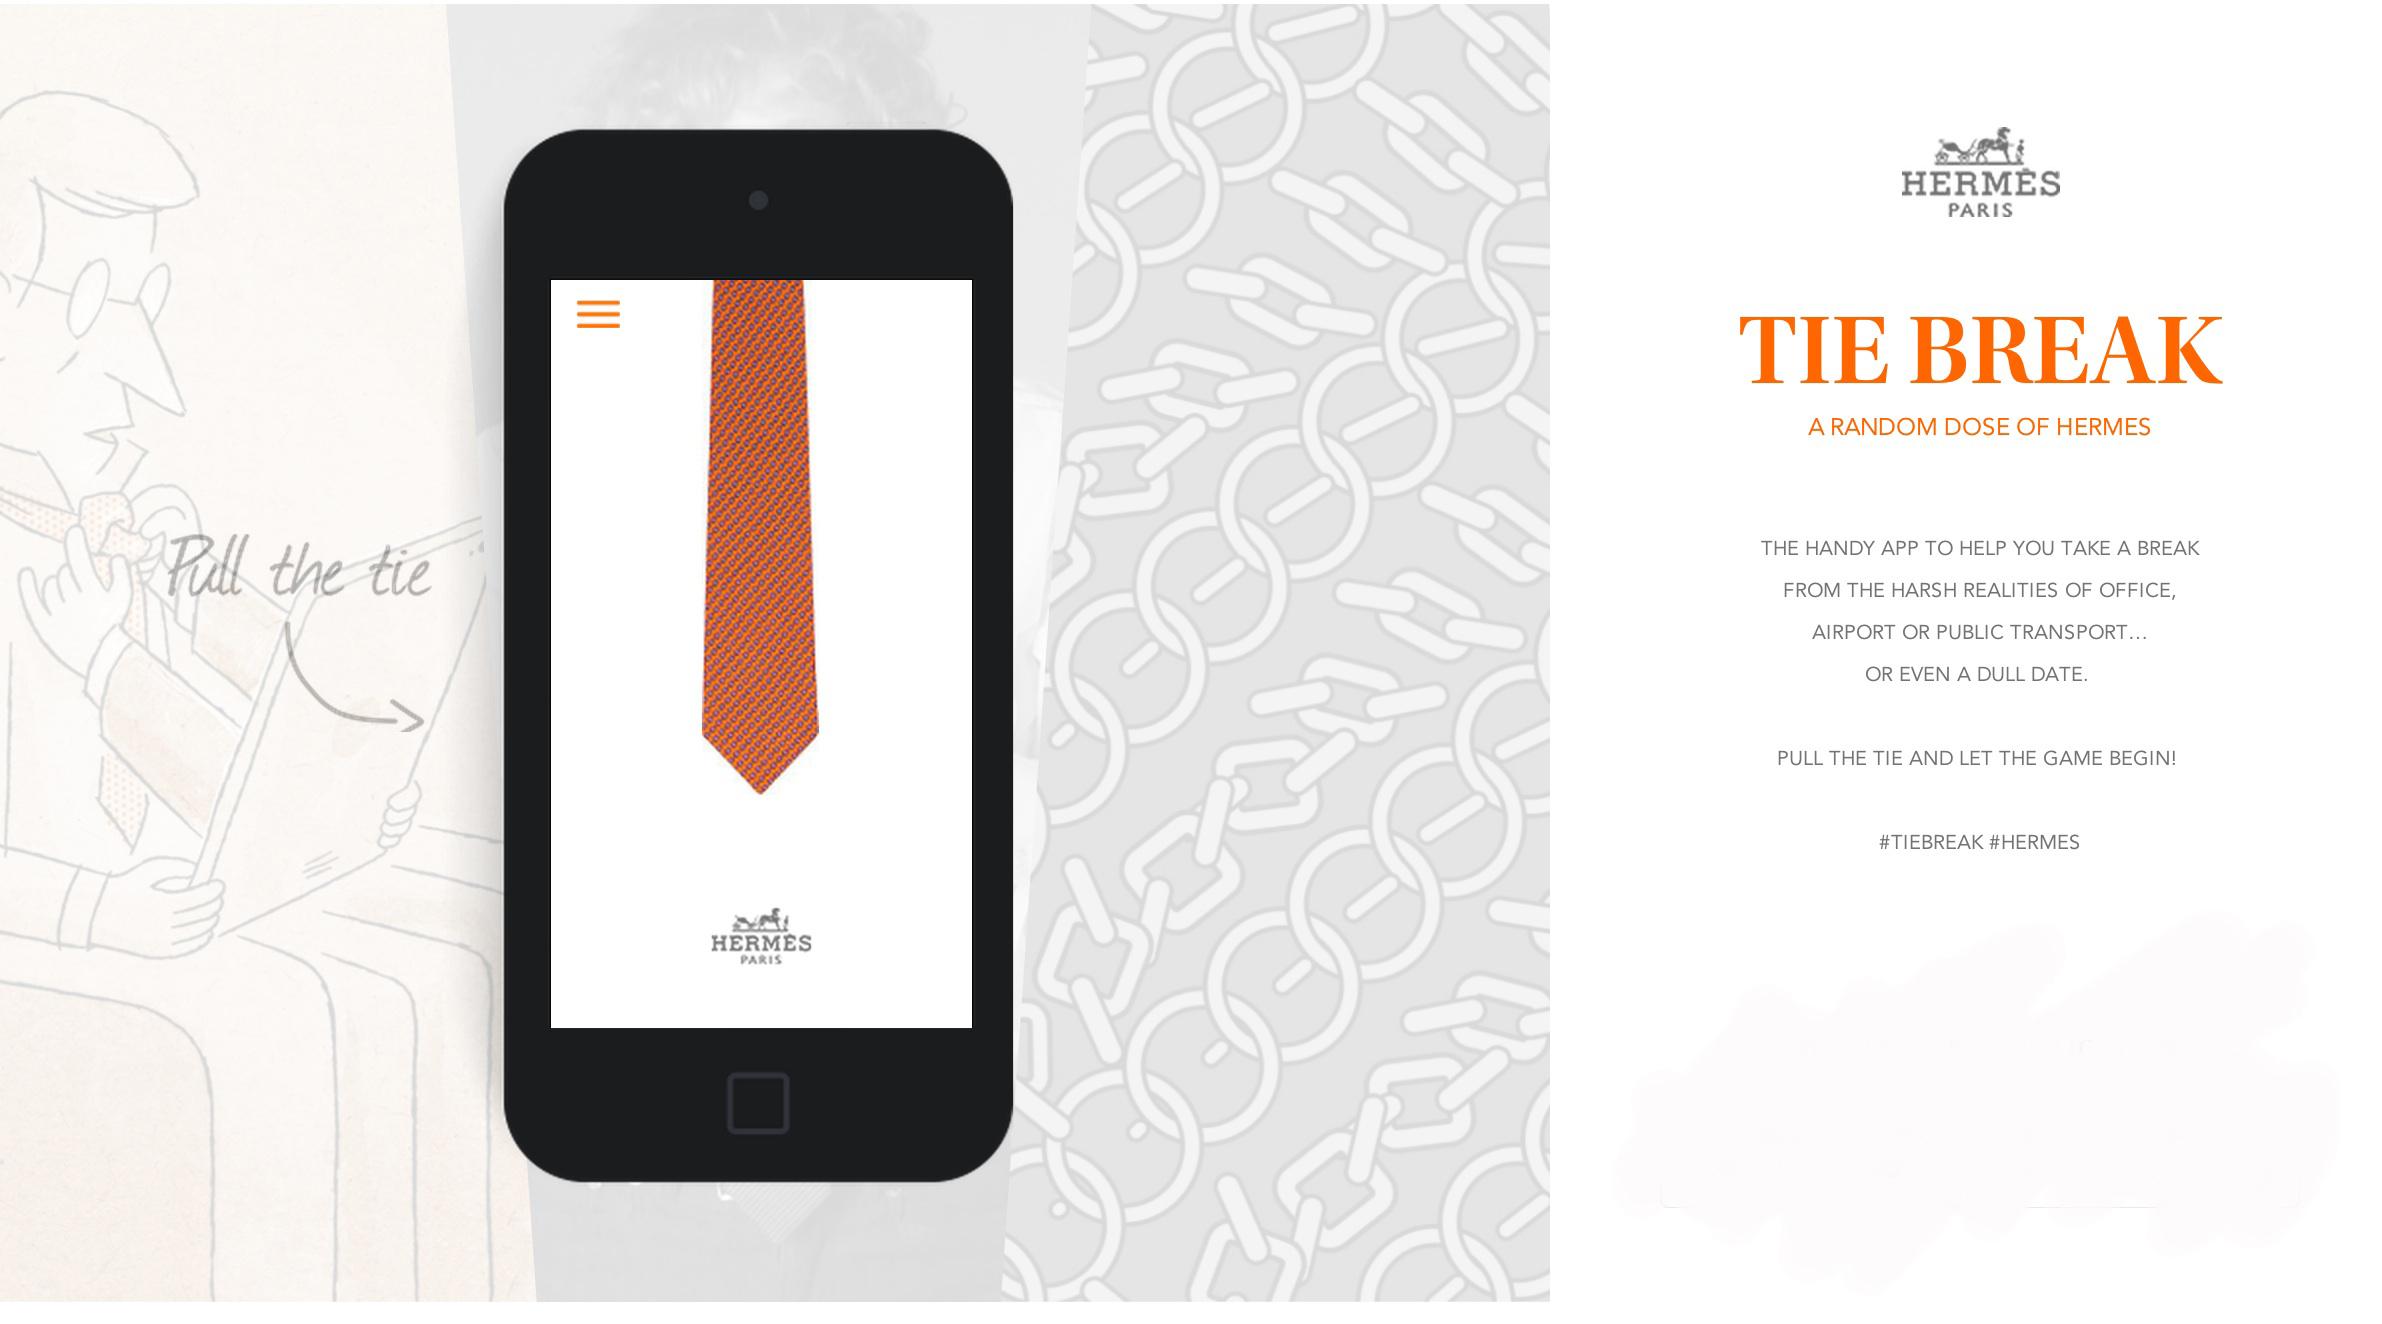 Hermes_Tie_Break_App_daily_cappuccino_lifestyle_blog